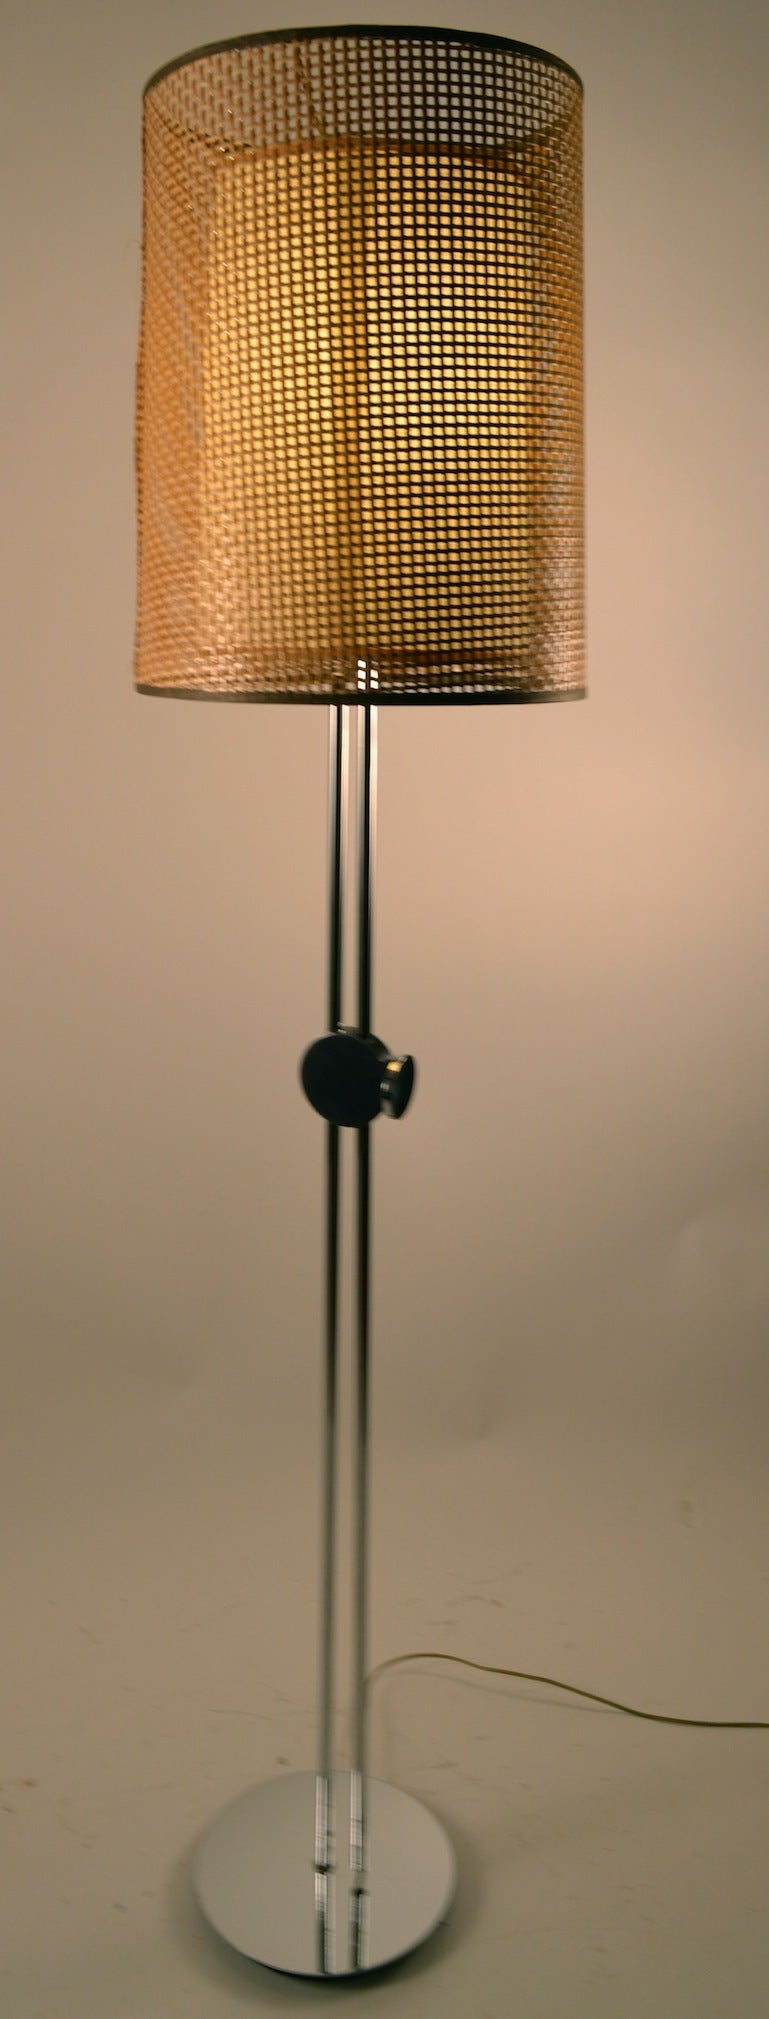 sonneman for george kovacs adjustable chrome floor lamp at 1stdibs. Black Bedroom Furniture Sets. Home Design Ideas